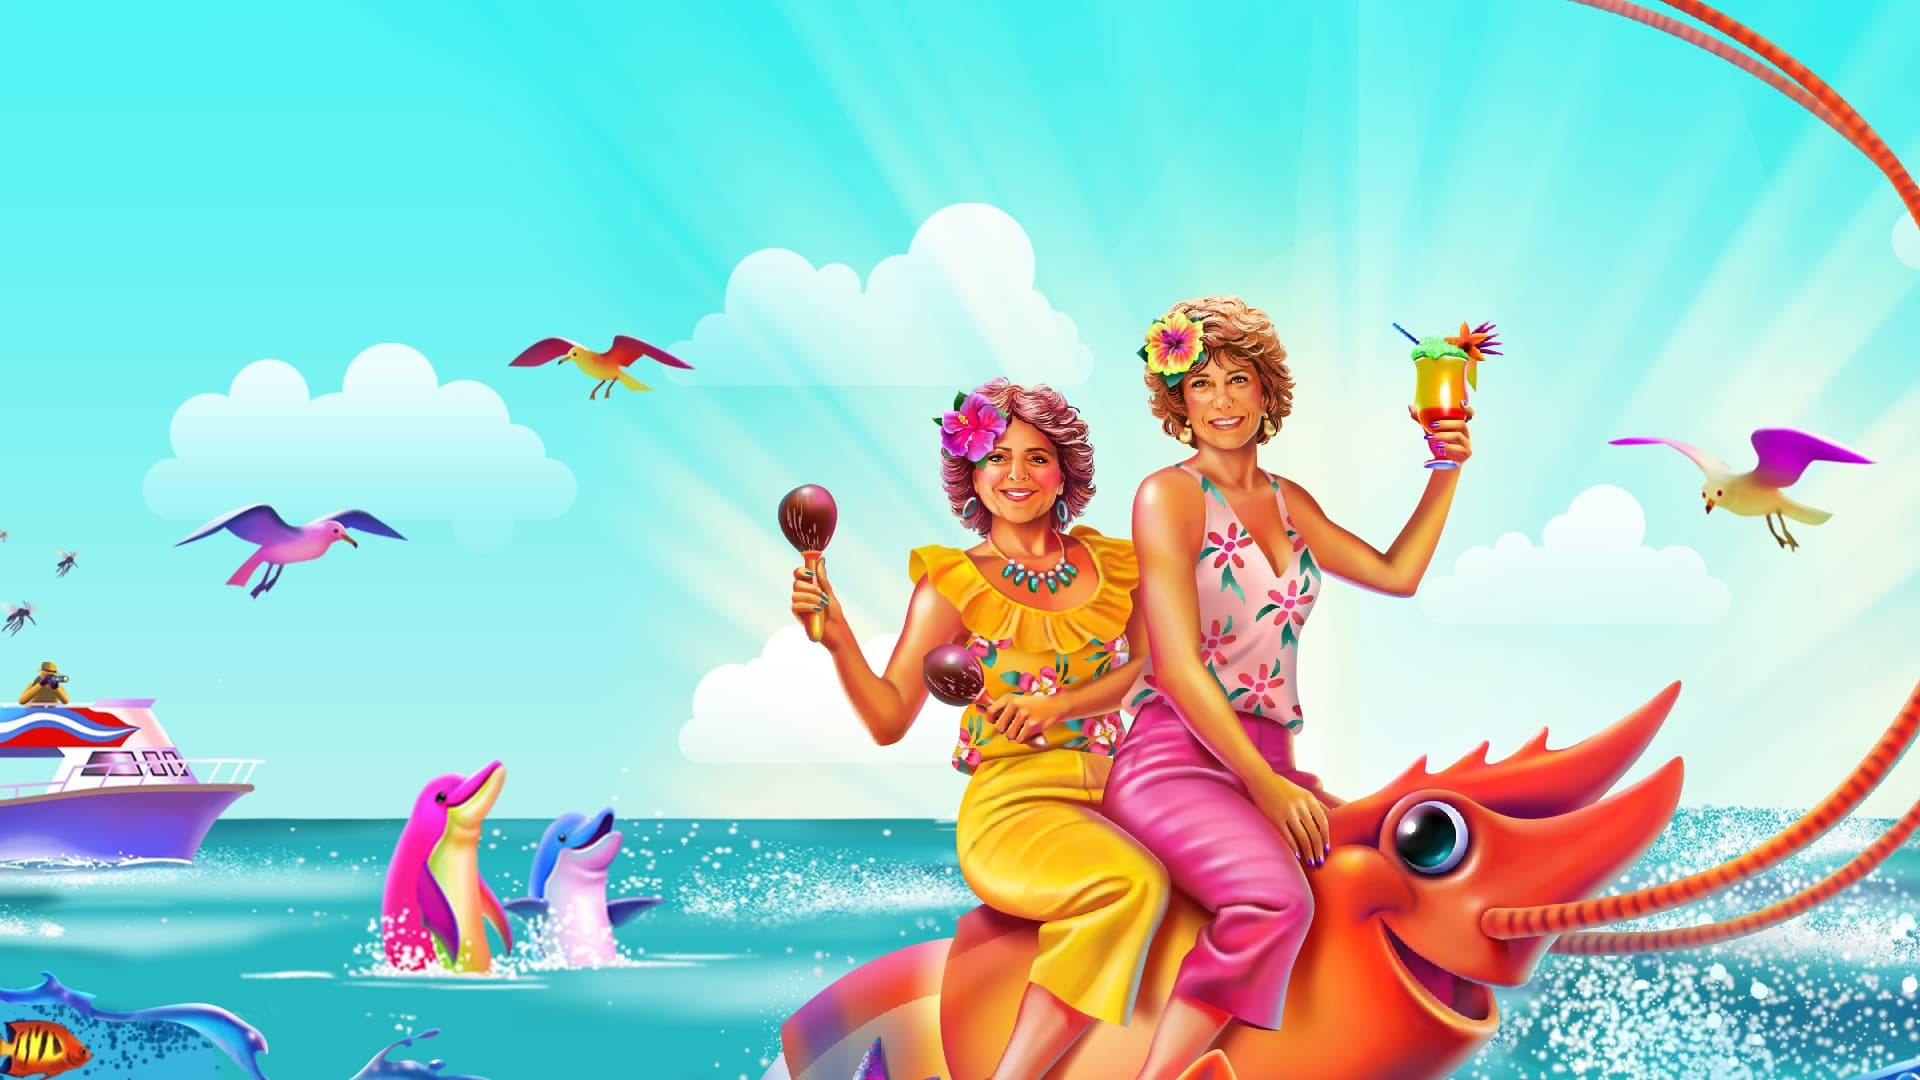 Barb & Star Go to Vista Del Mar (2021) Watch Online